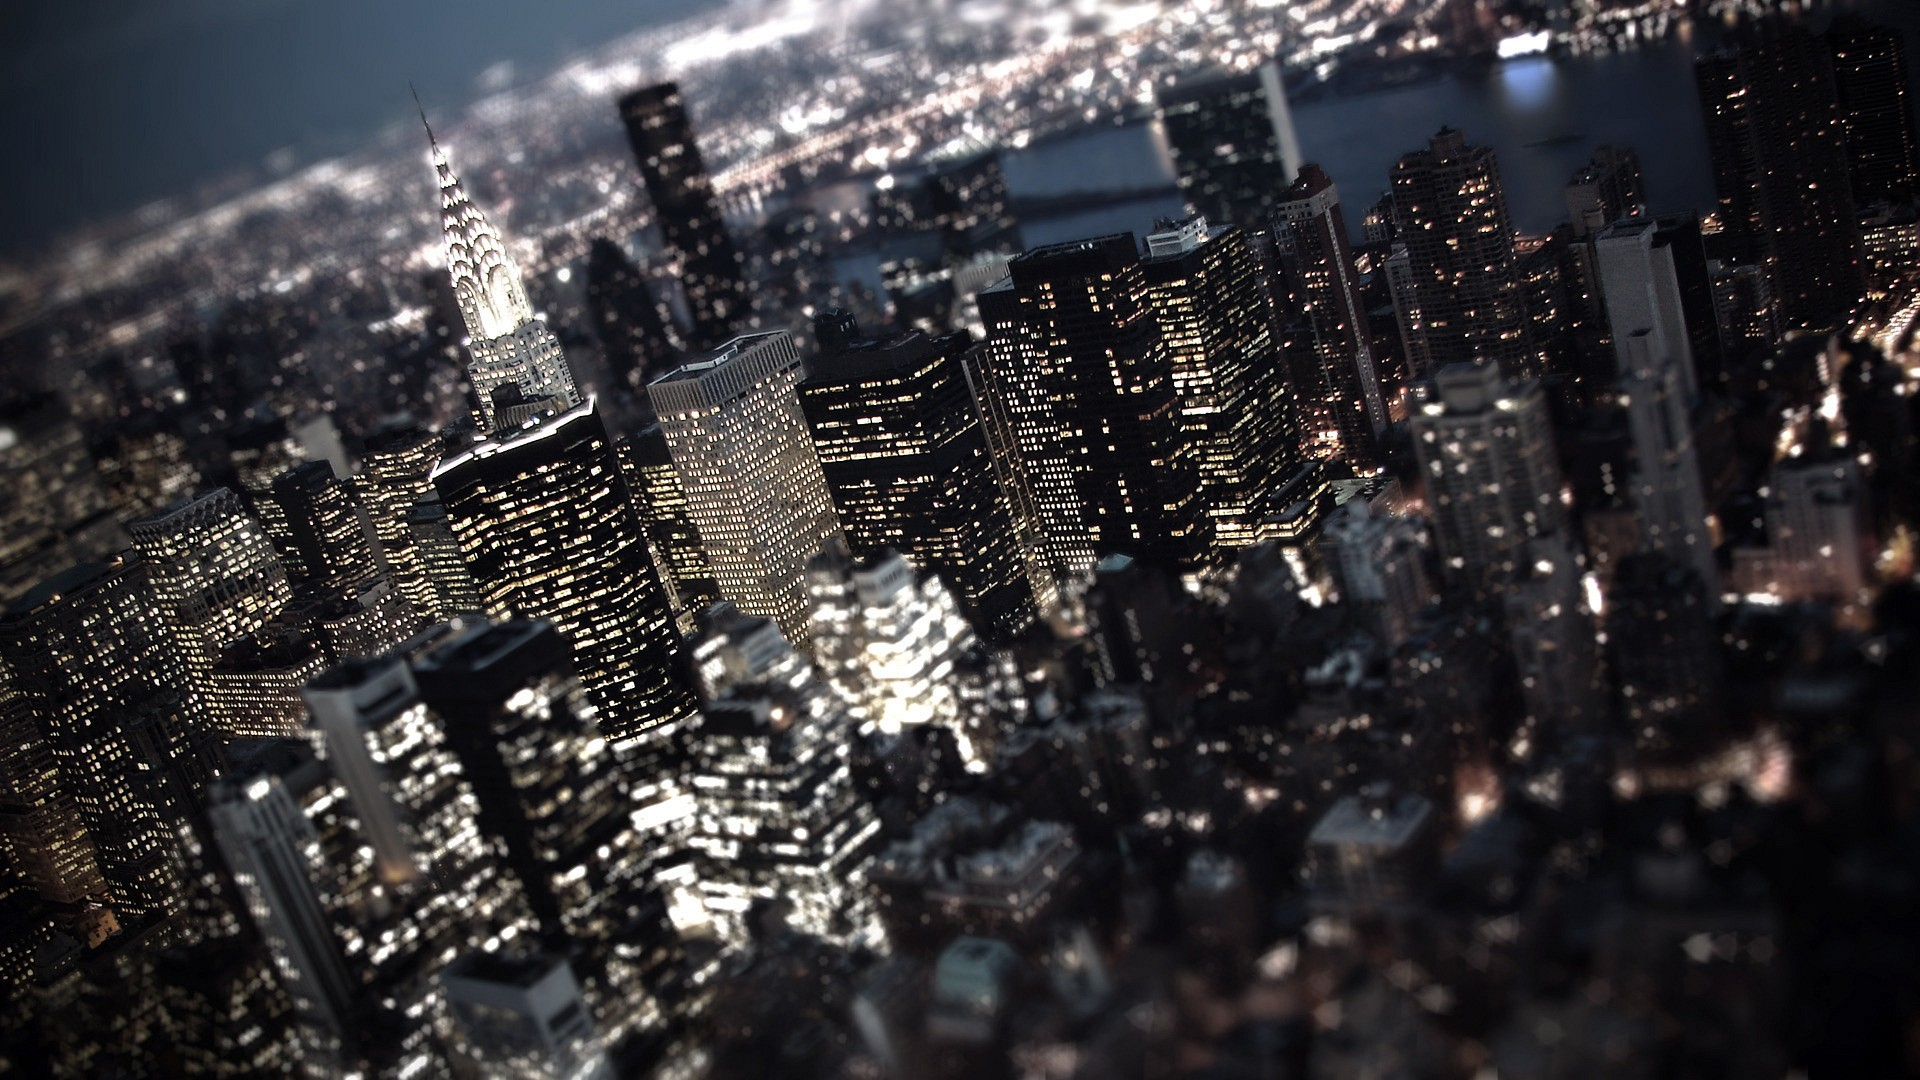 Wallpaper My Blog - New York City Night Time - HD Wallpaper